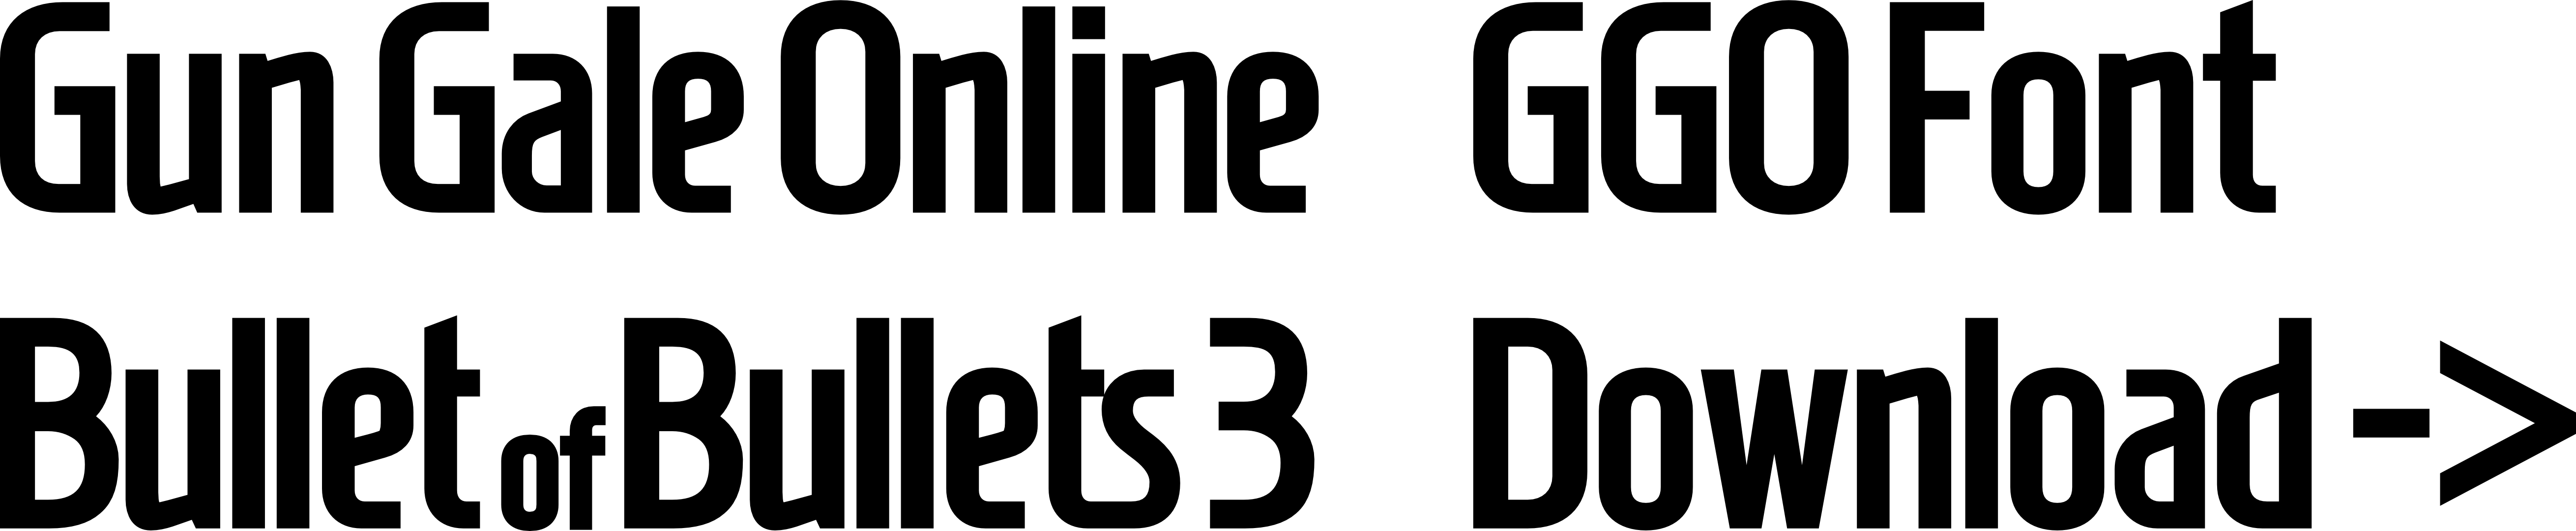 One Line Font Art : Gun gale online ggo title logo font by darkblackswords